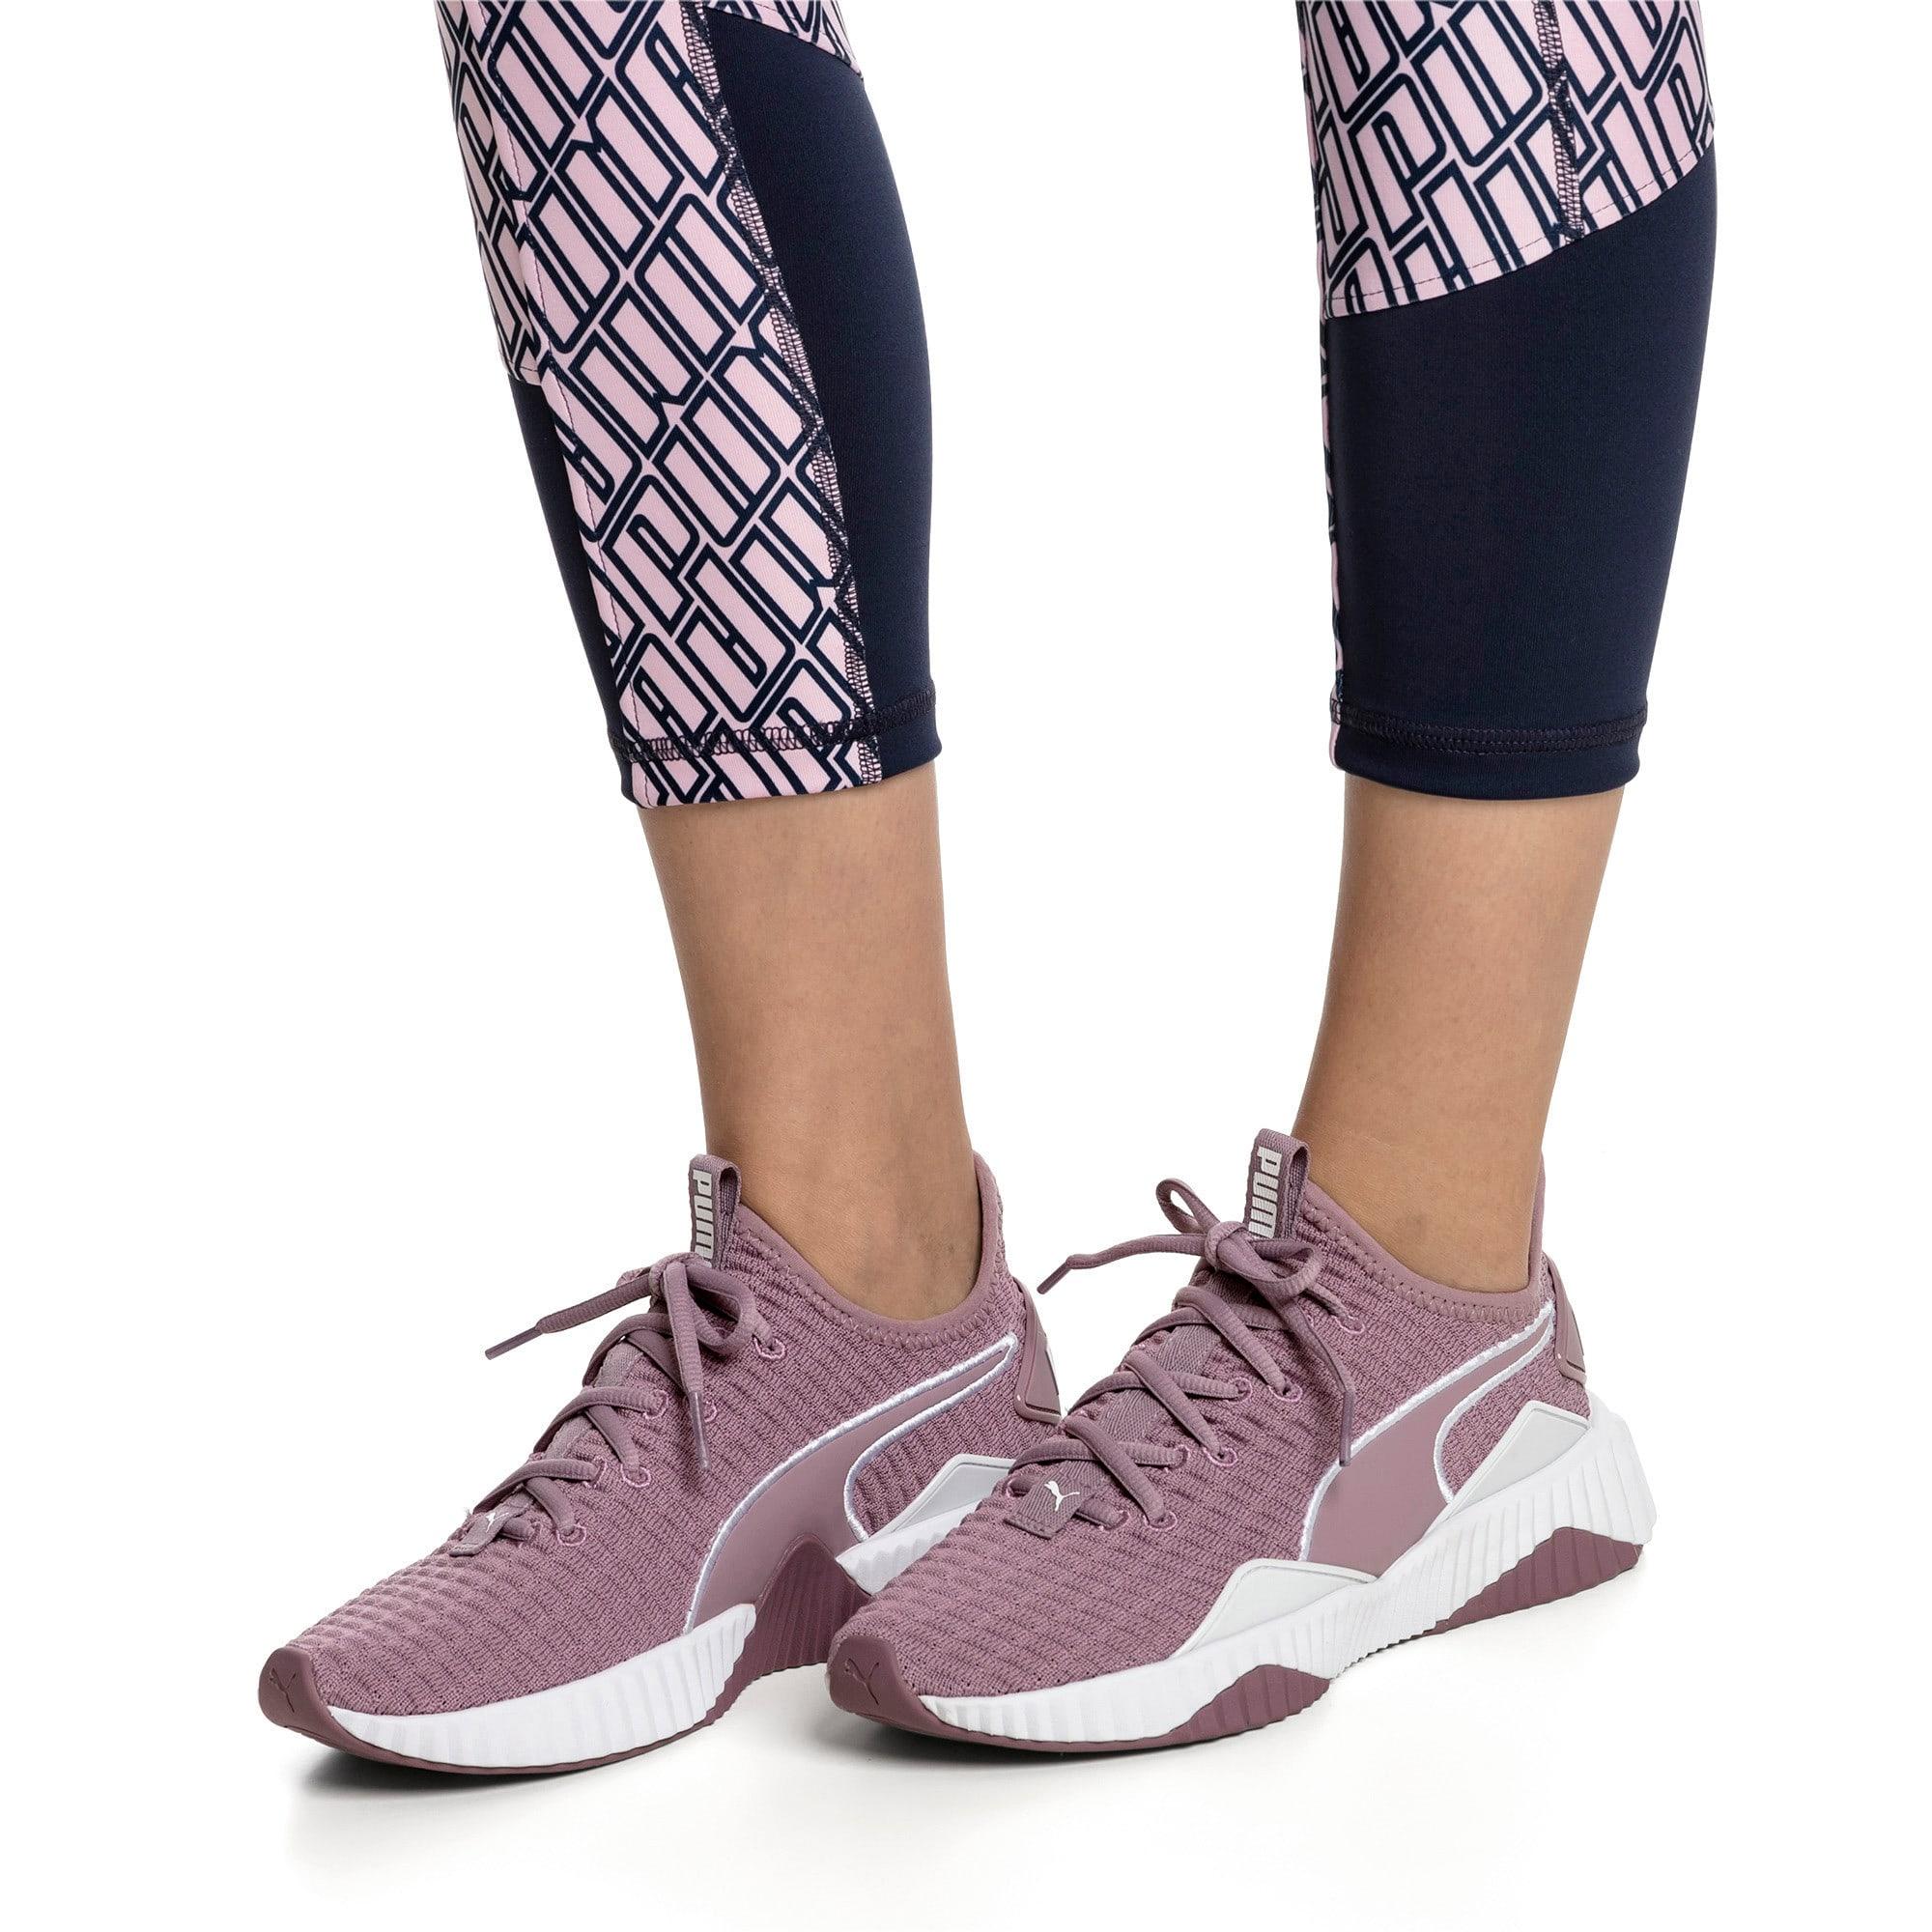 Thumbnail 7 of Defy Women's Training Shoes, Elderberry-Puma White, medium